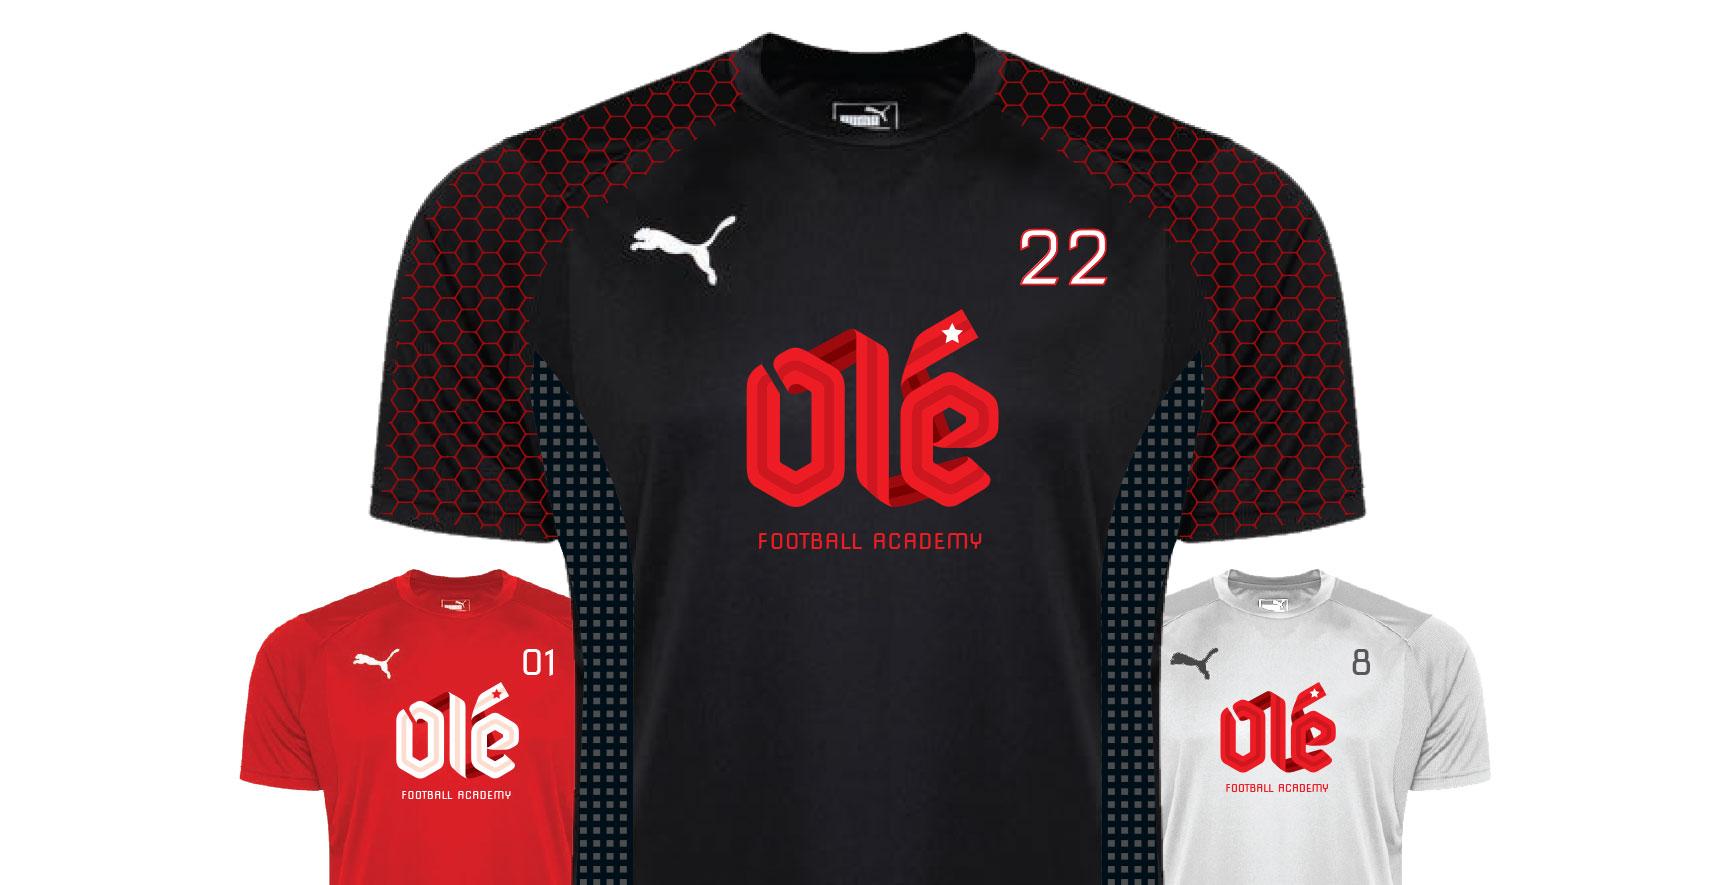 Ole FA_Player Uniforms